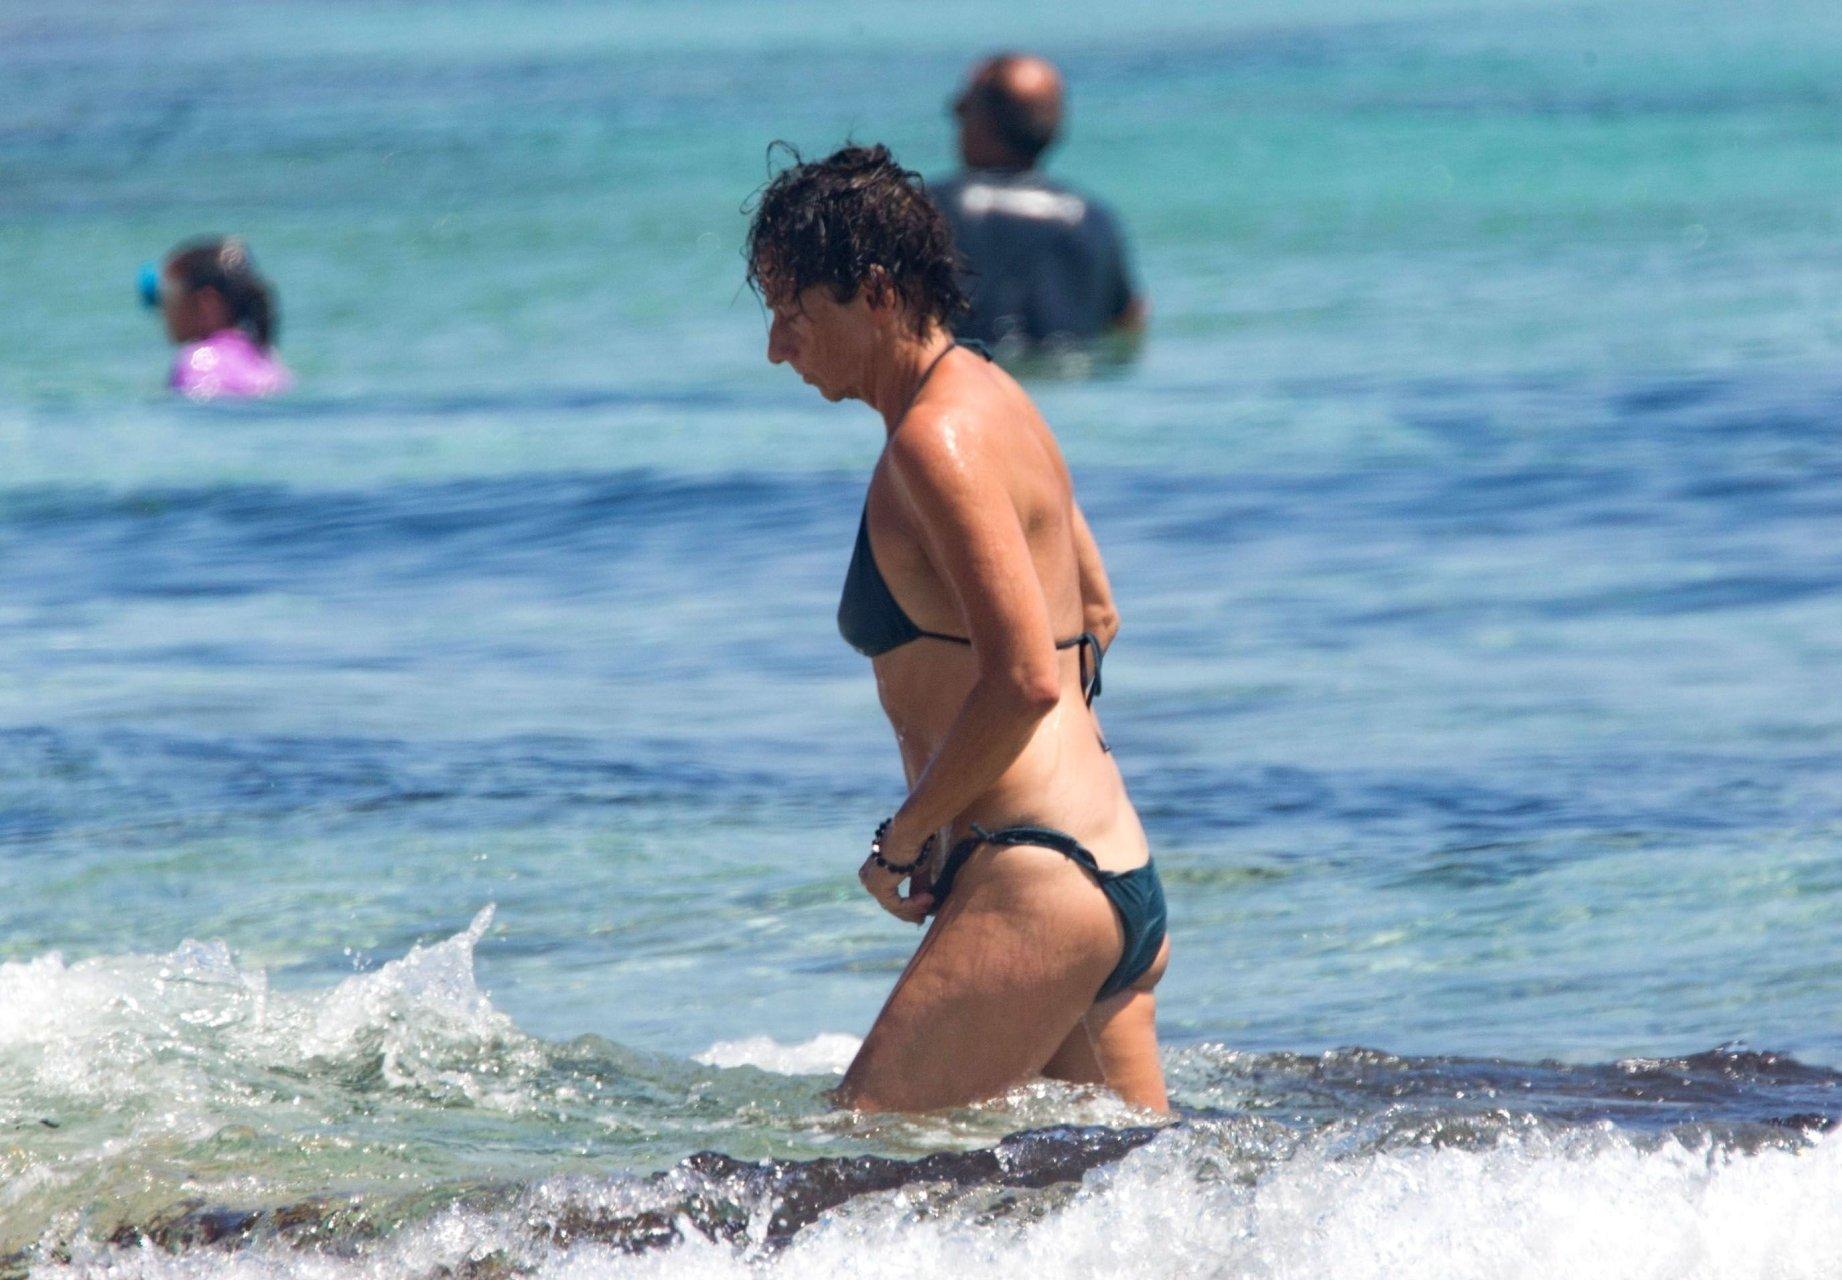 Fappening Gianna Nannini nudes (51 foto and video), Ass, Bikini, Twitter, cameltoe 2015